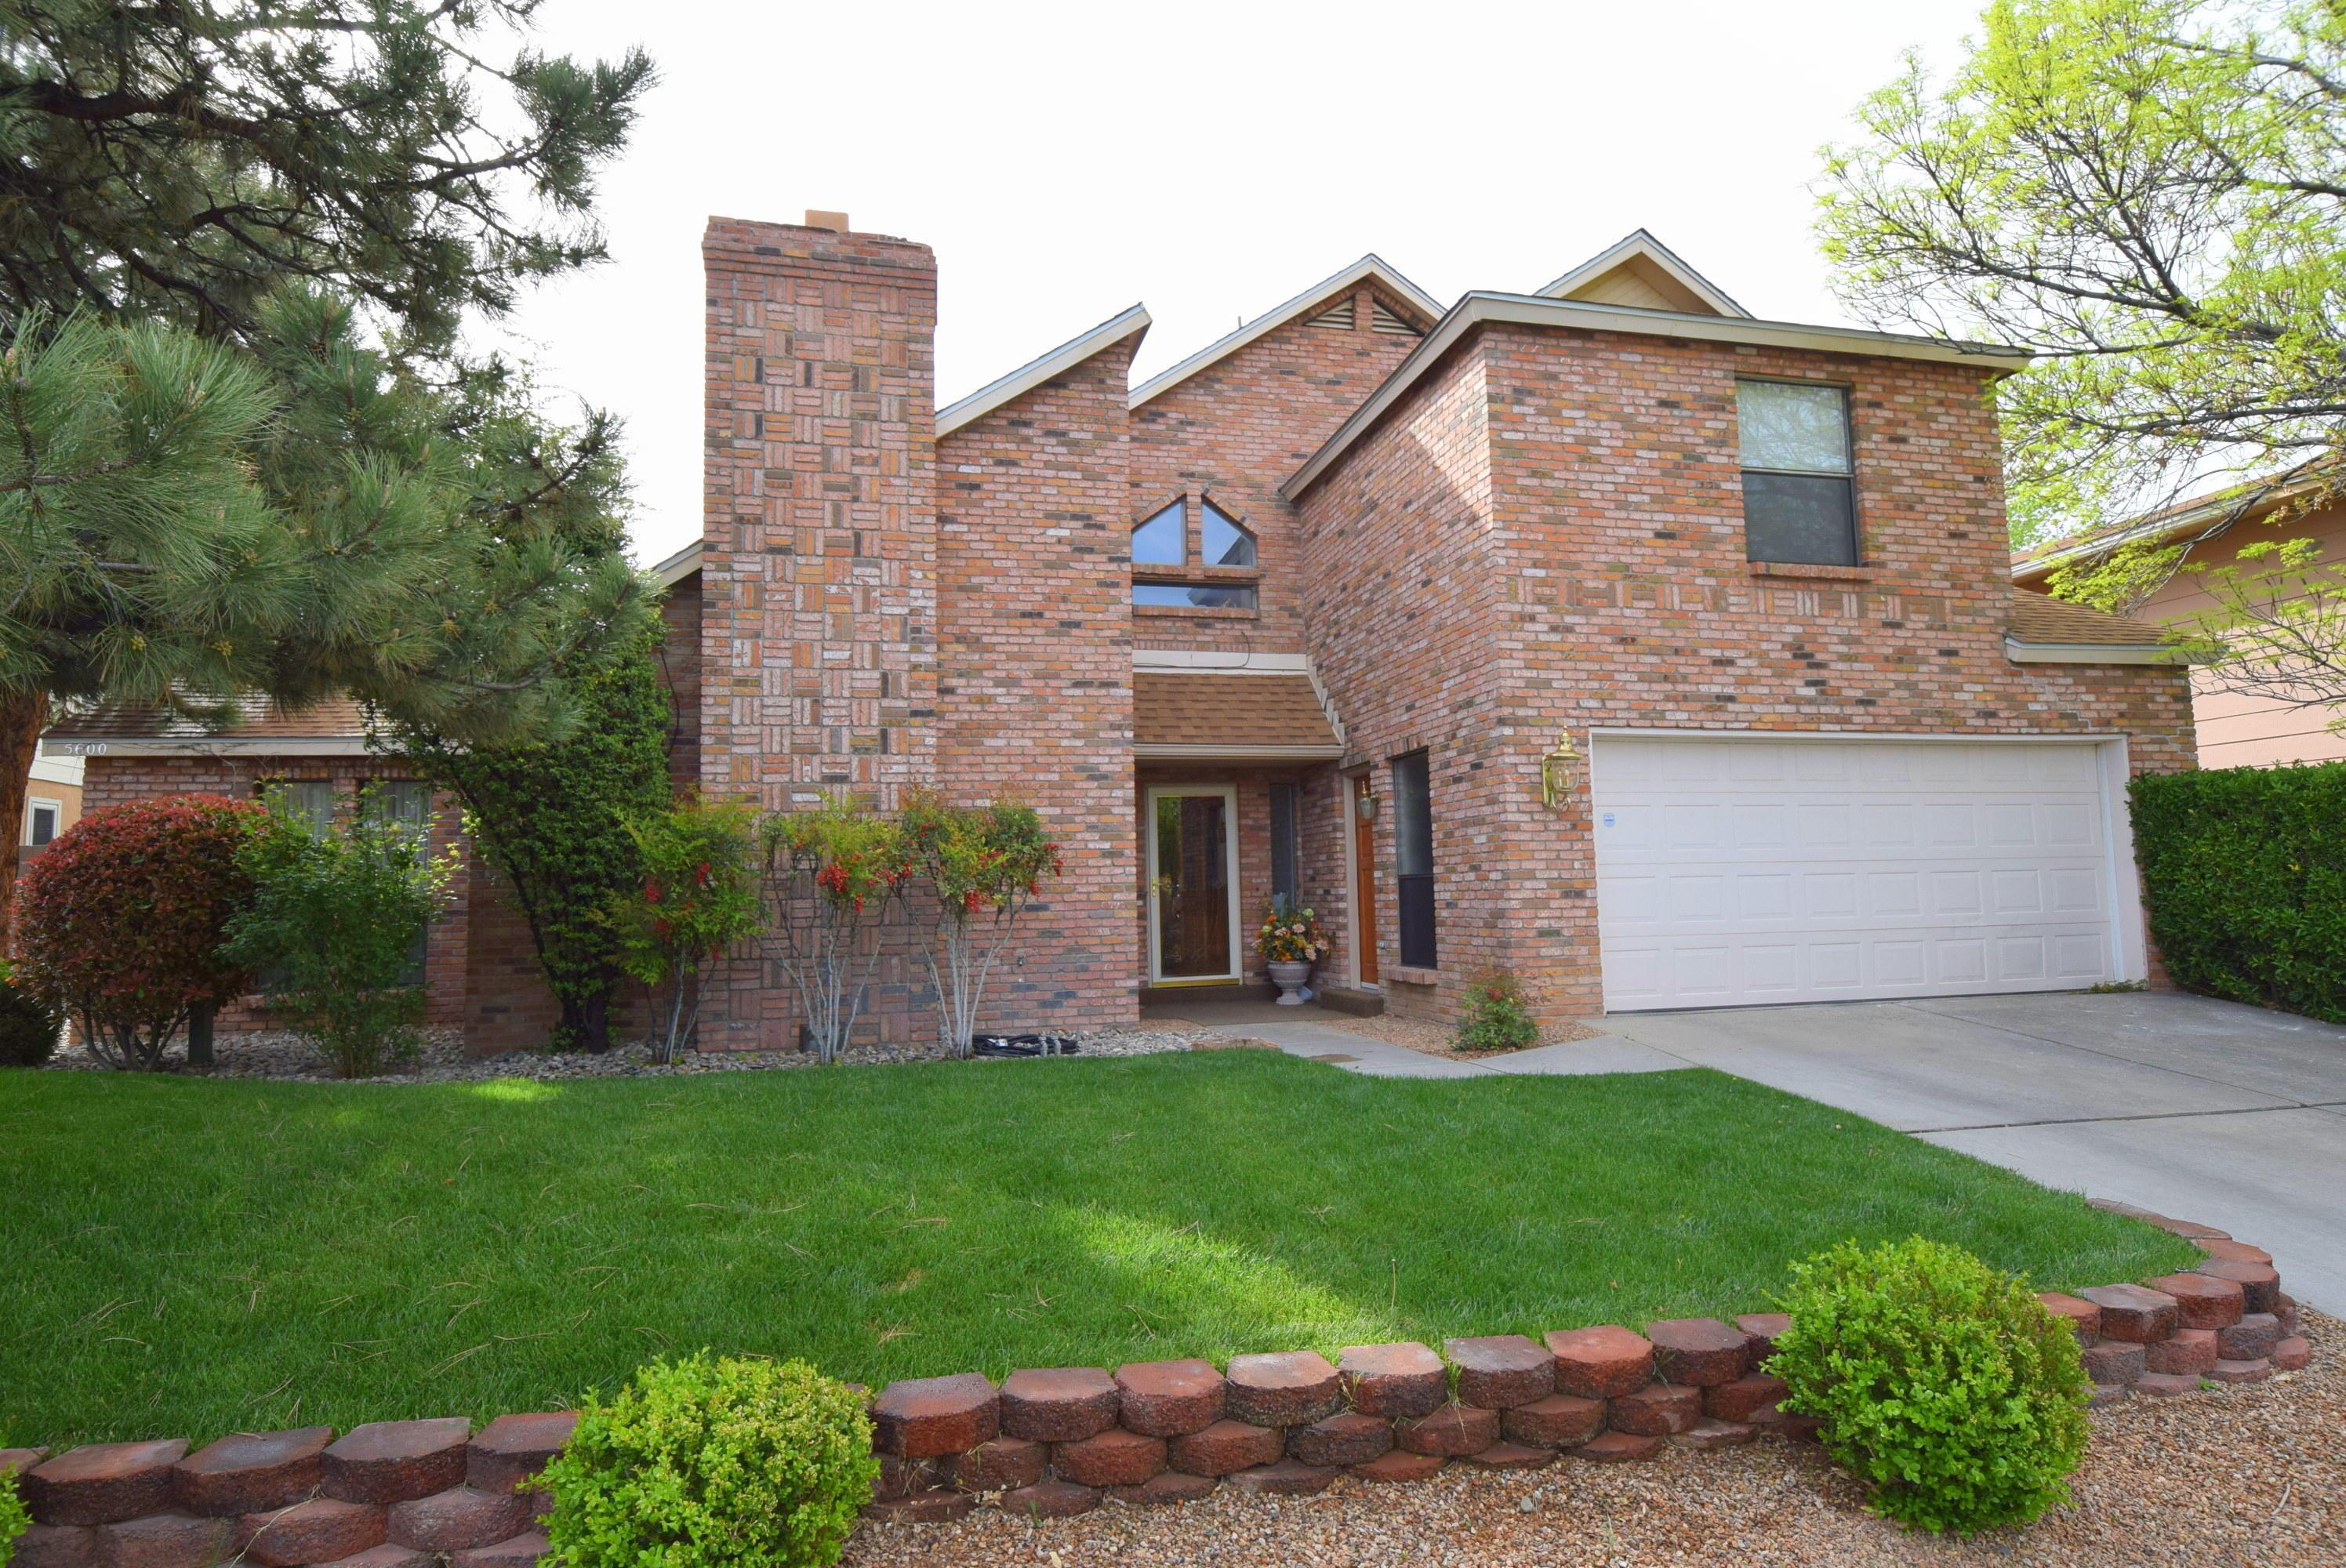 5600 Chelwood Park Boulevard NE, Albuquerque, NM 87111 - Albuquerque, NM real estate listing